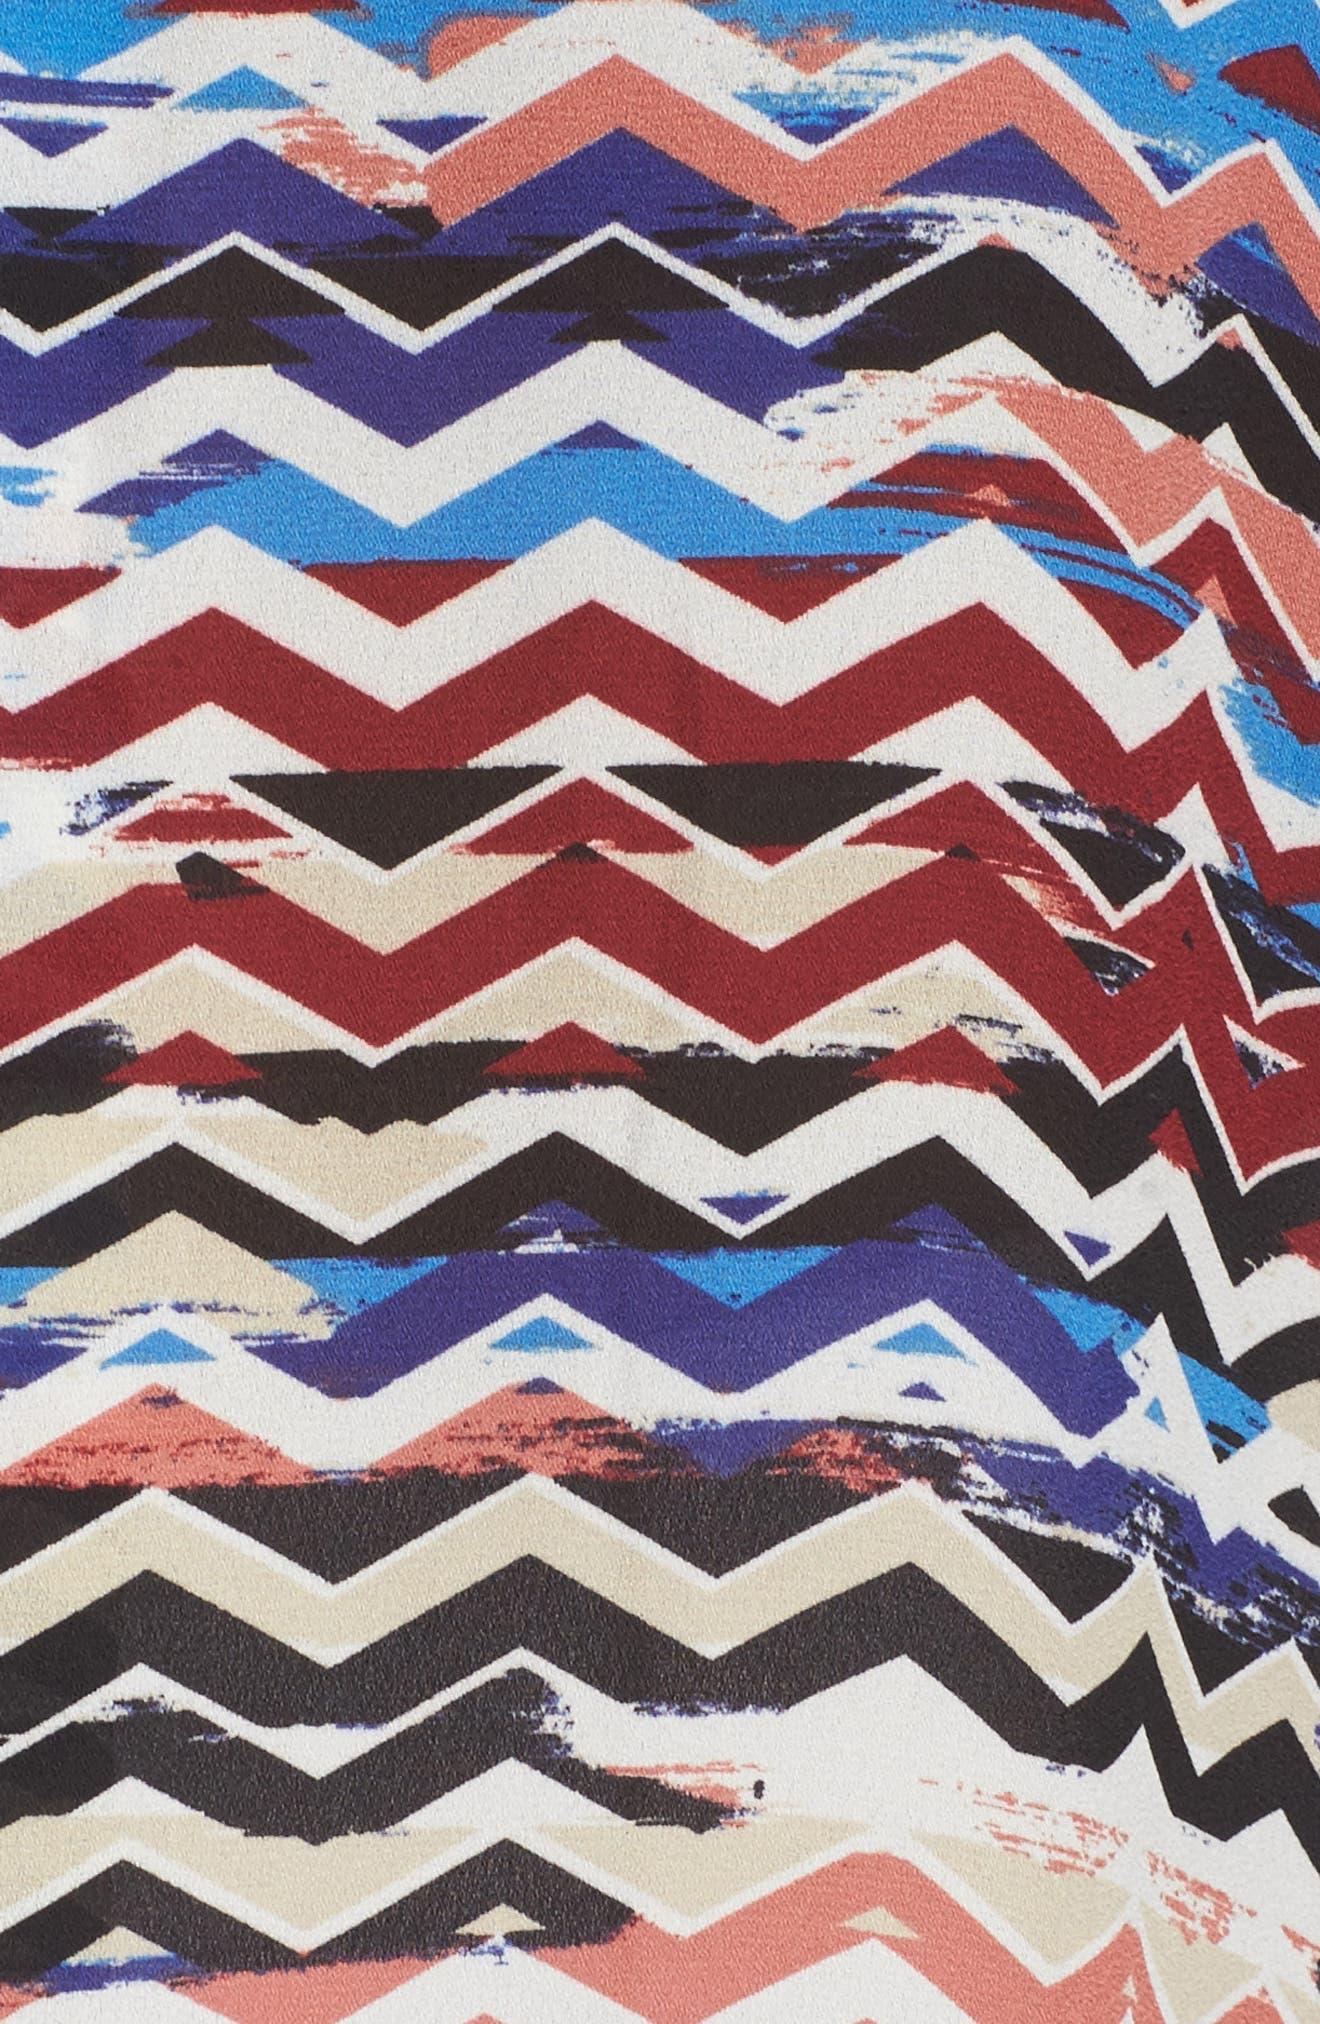 Herringbone Muses Pleat Front Top,                             Alternate thumbnail 5, color,                             001